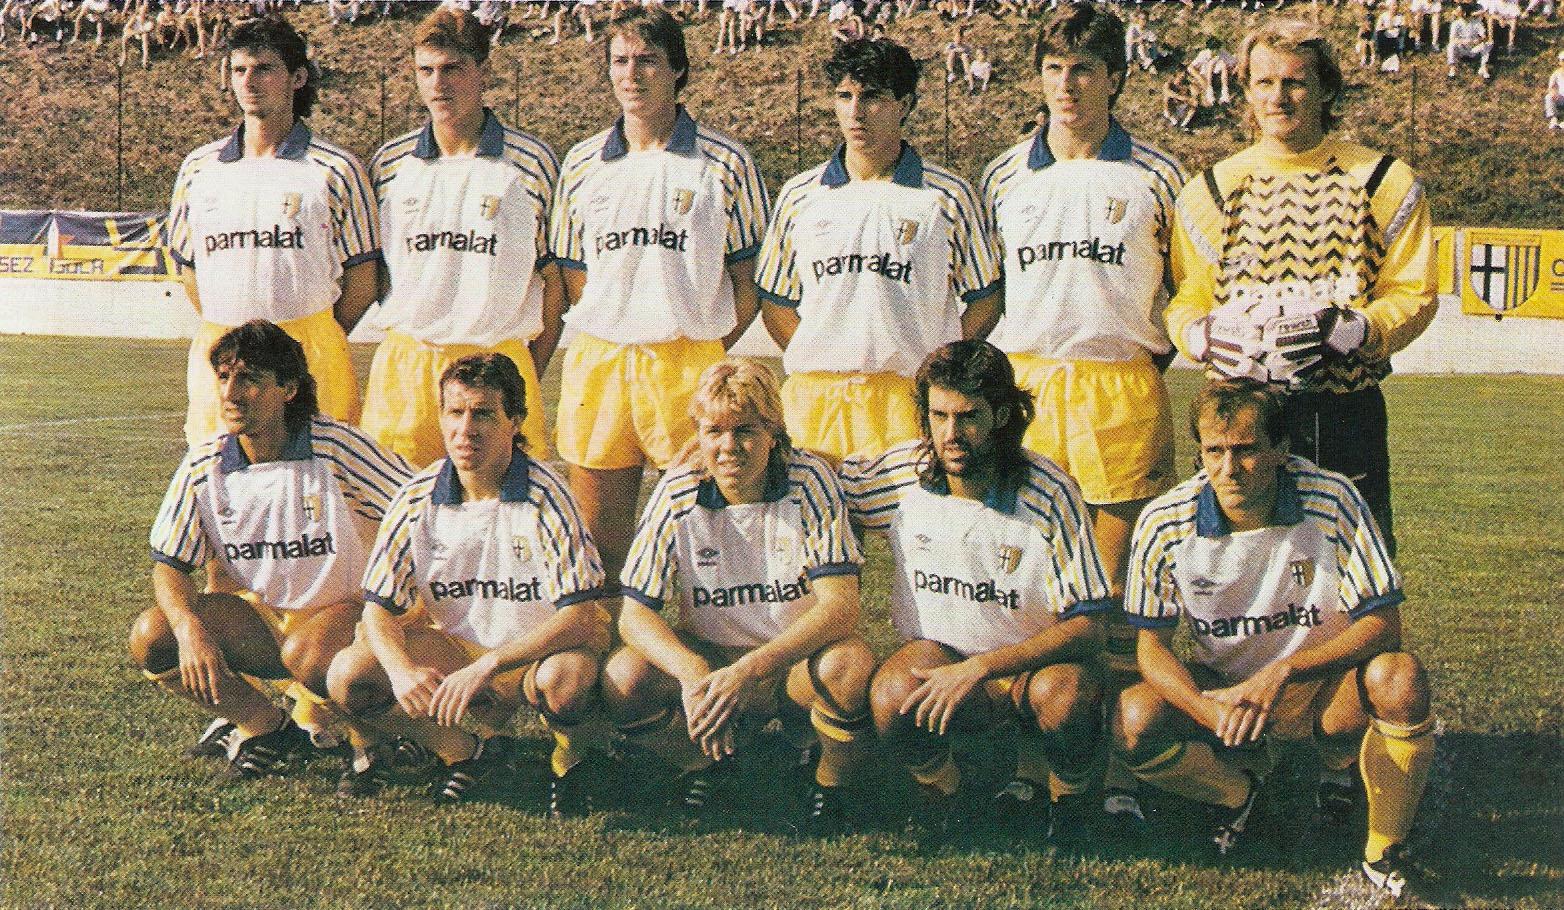 File:Parma 1990-91.jpg - Wikipedia